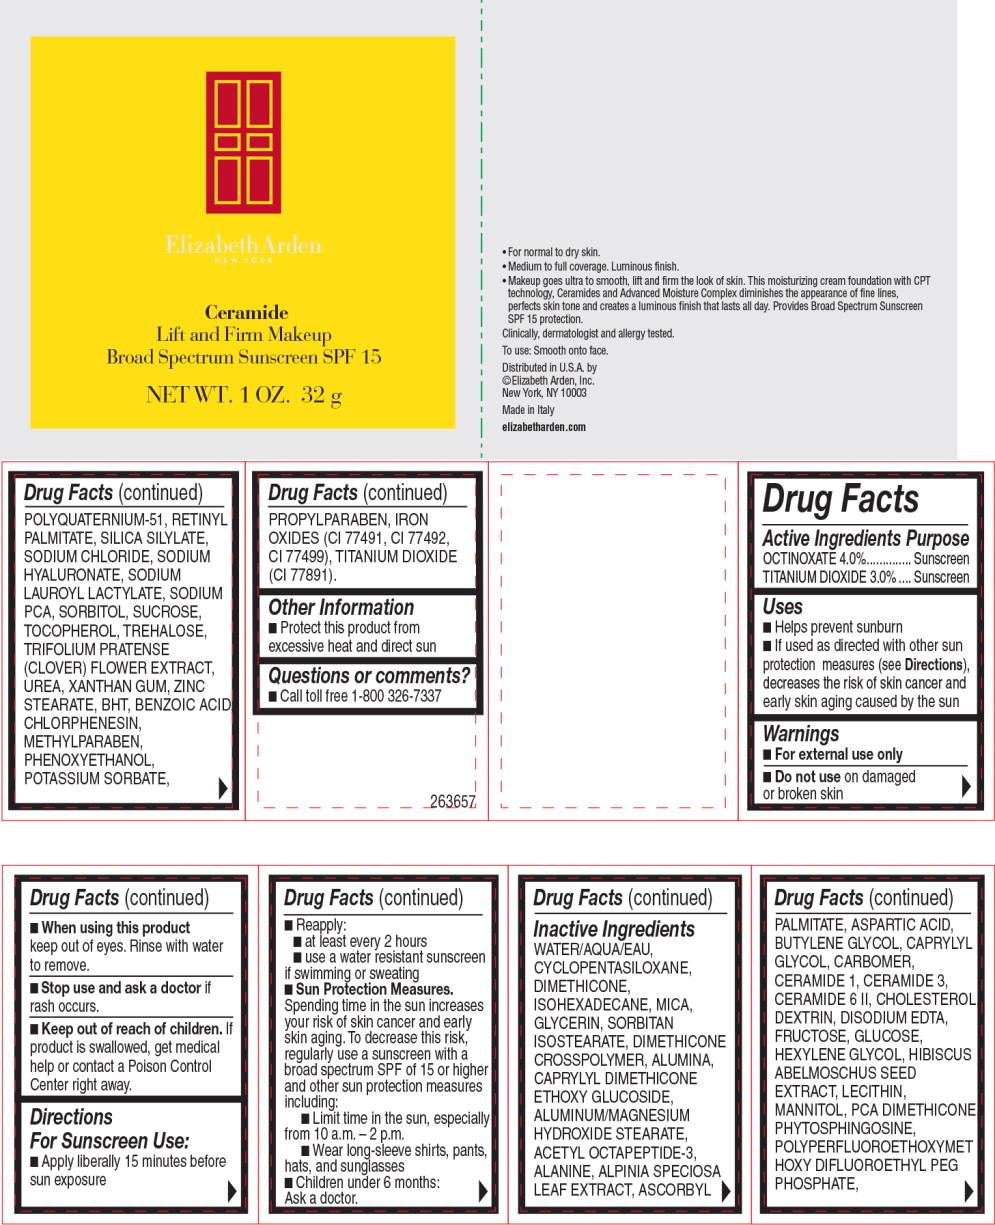 Ceramide Lift And Firm Makeup Broad Spectrum Sunscreen Spf 15 Toasty Beige (Octinoxate, Titanium Dioxide) Cream [Elizabeth Arden, Inc]